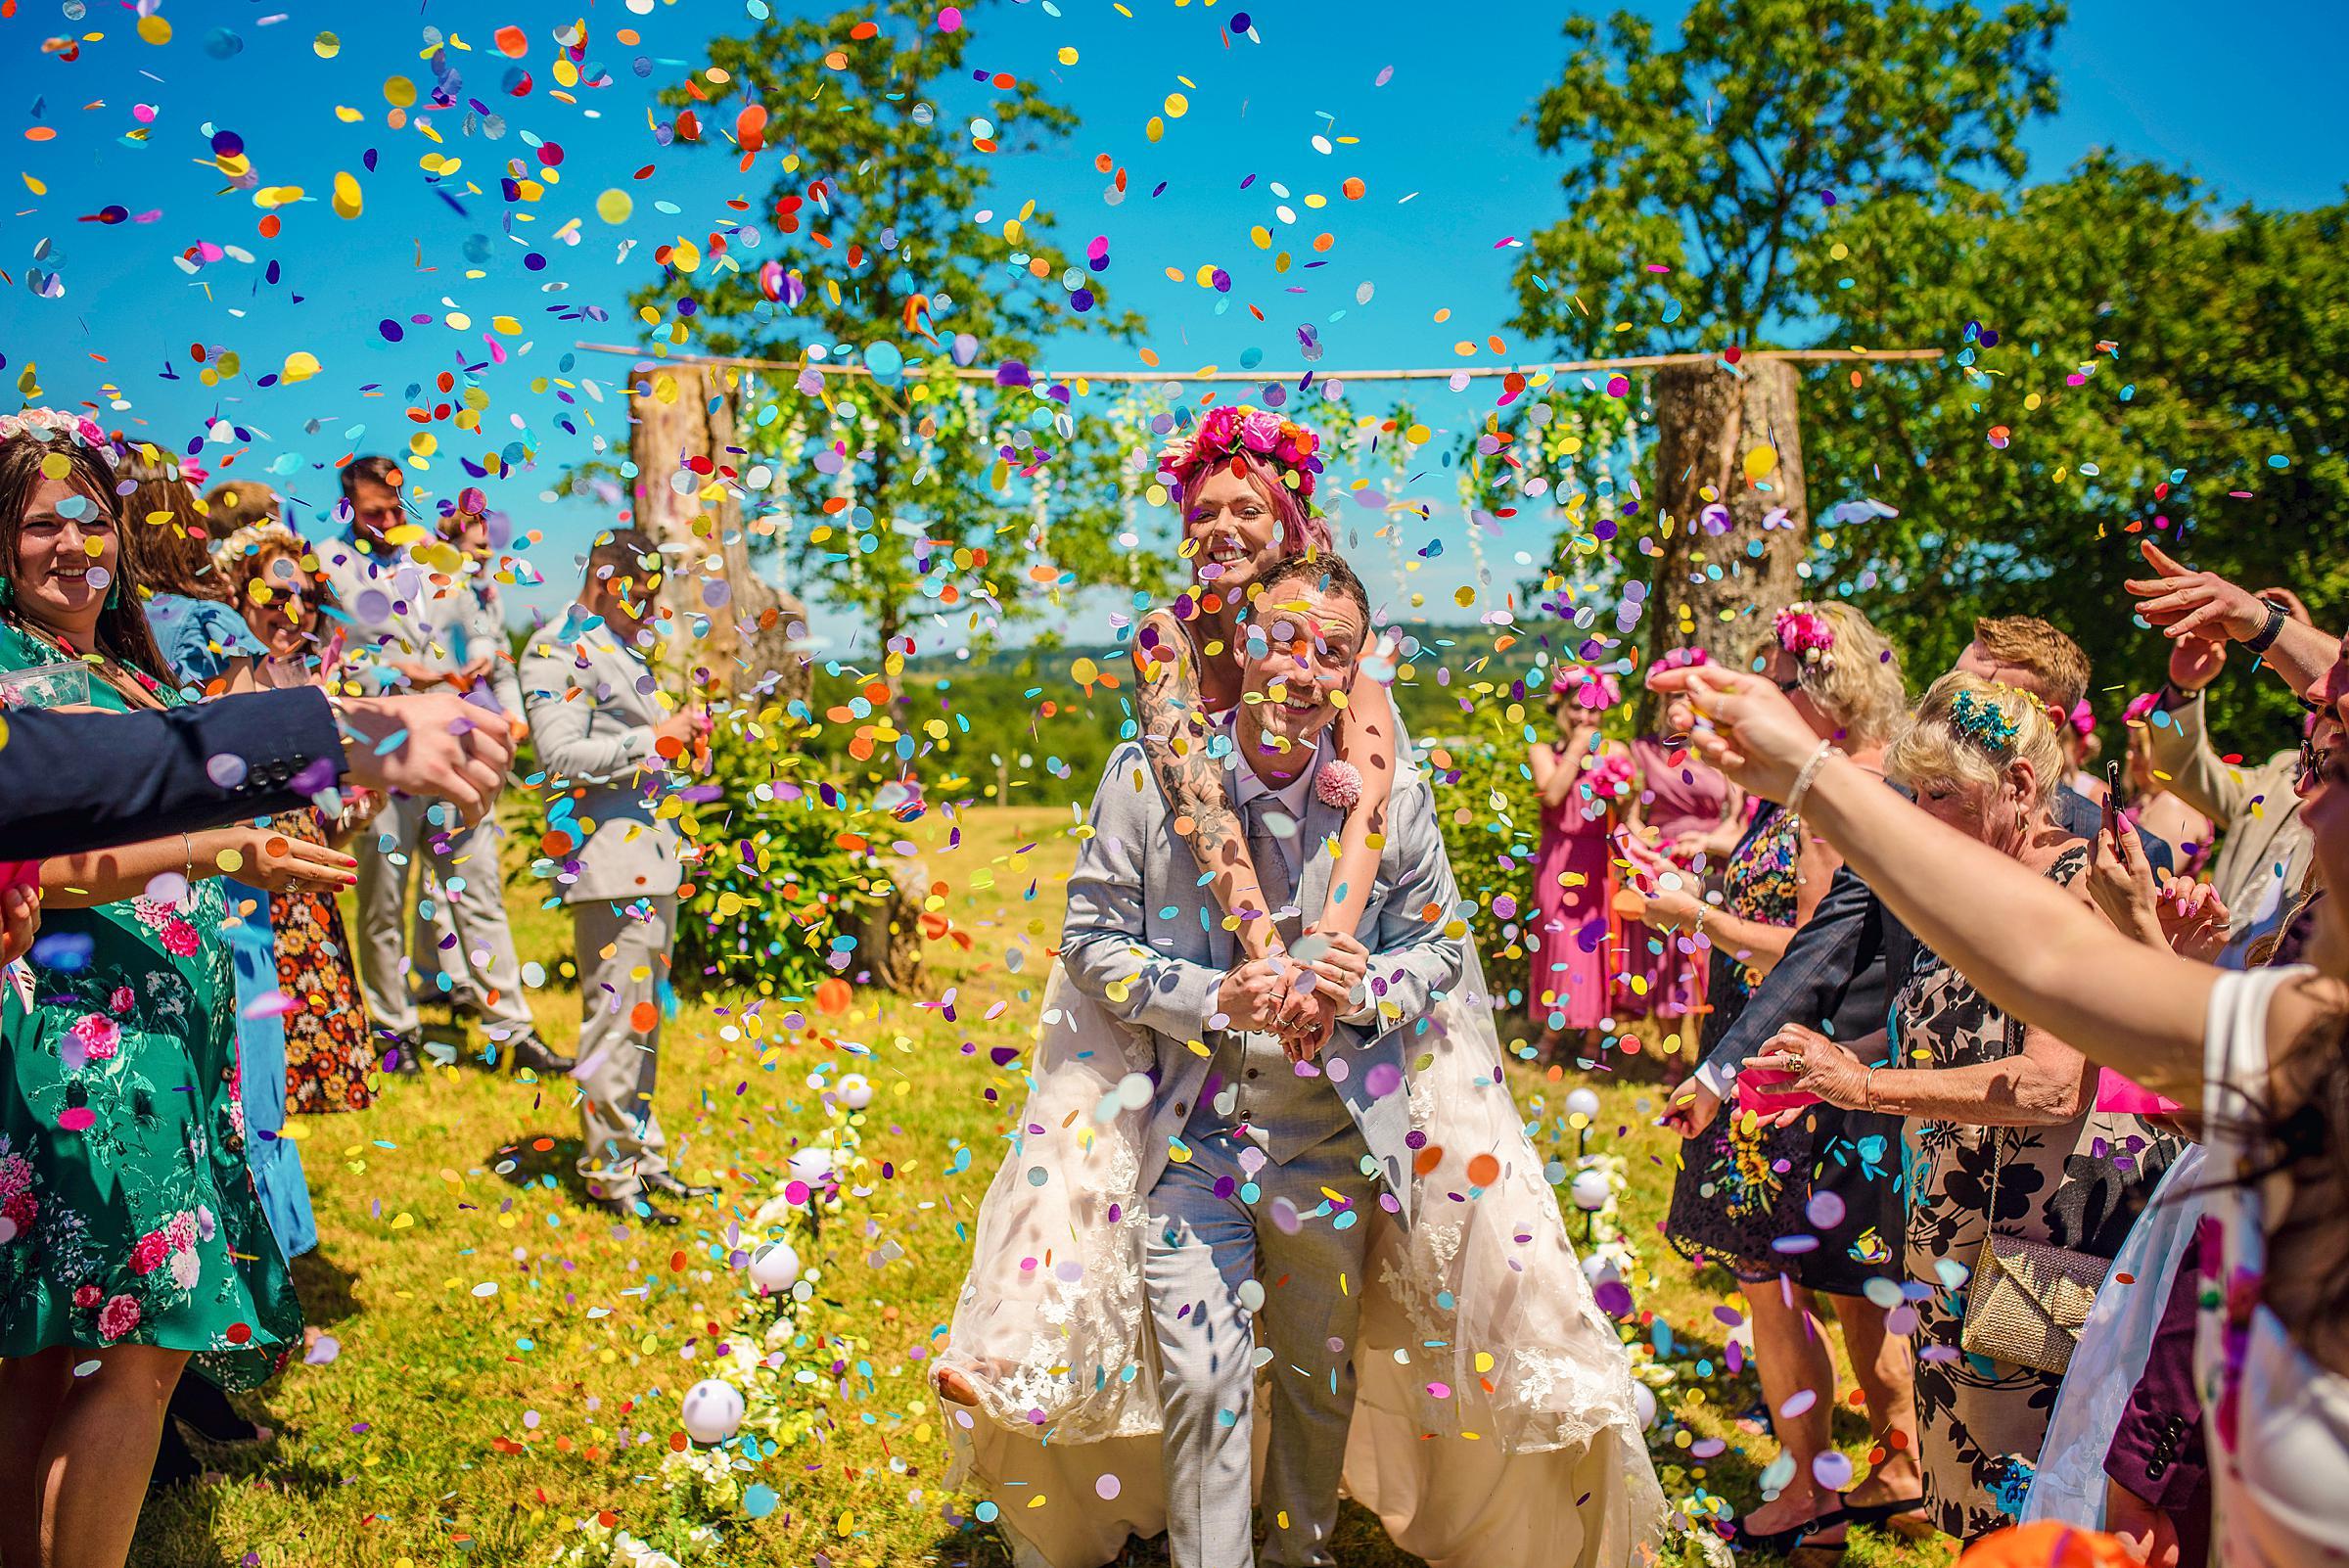 Back Garden Festival Wedding in France Load of Confetti